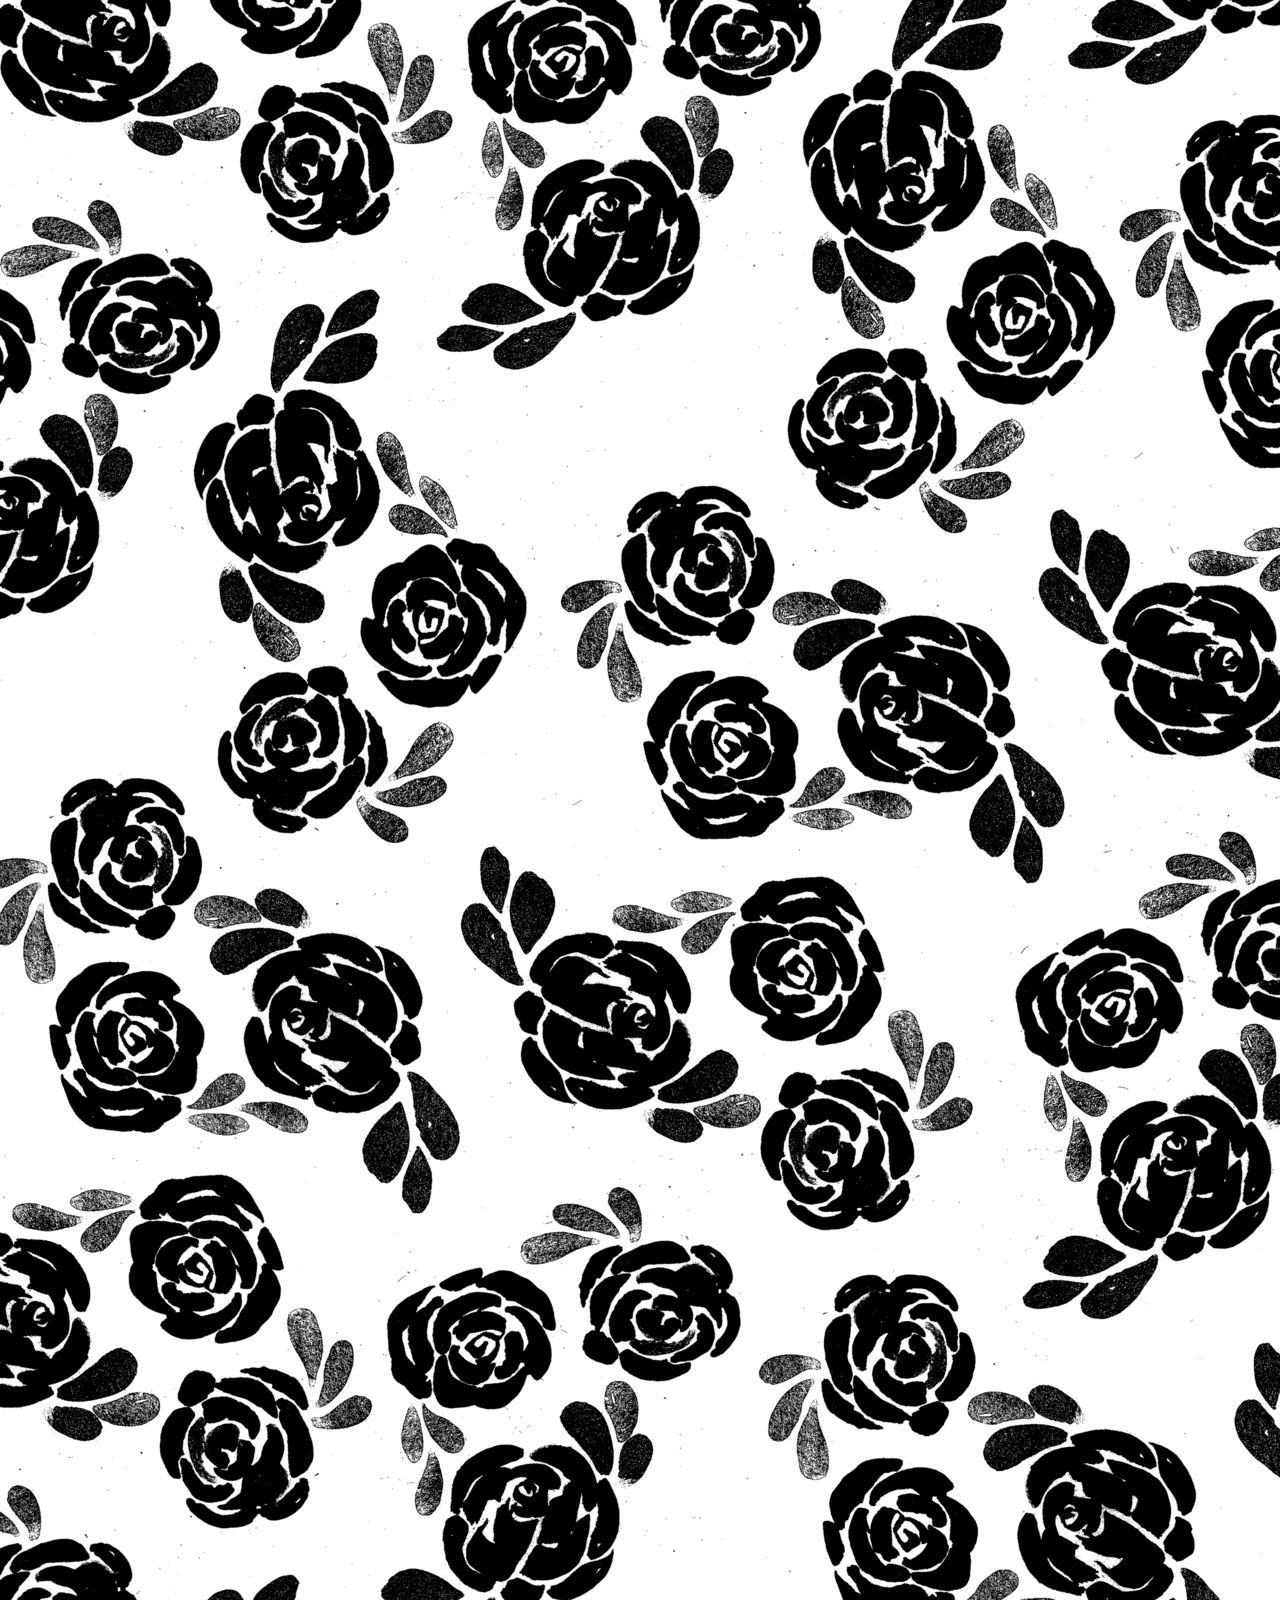 Printable Wallpaper: Papier Fabrik: Black And White Roses